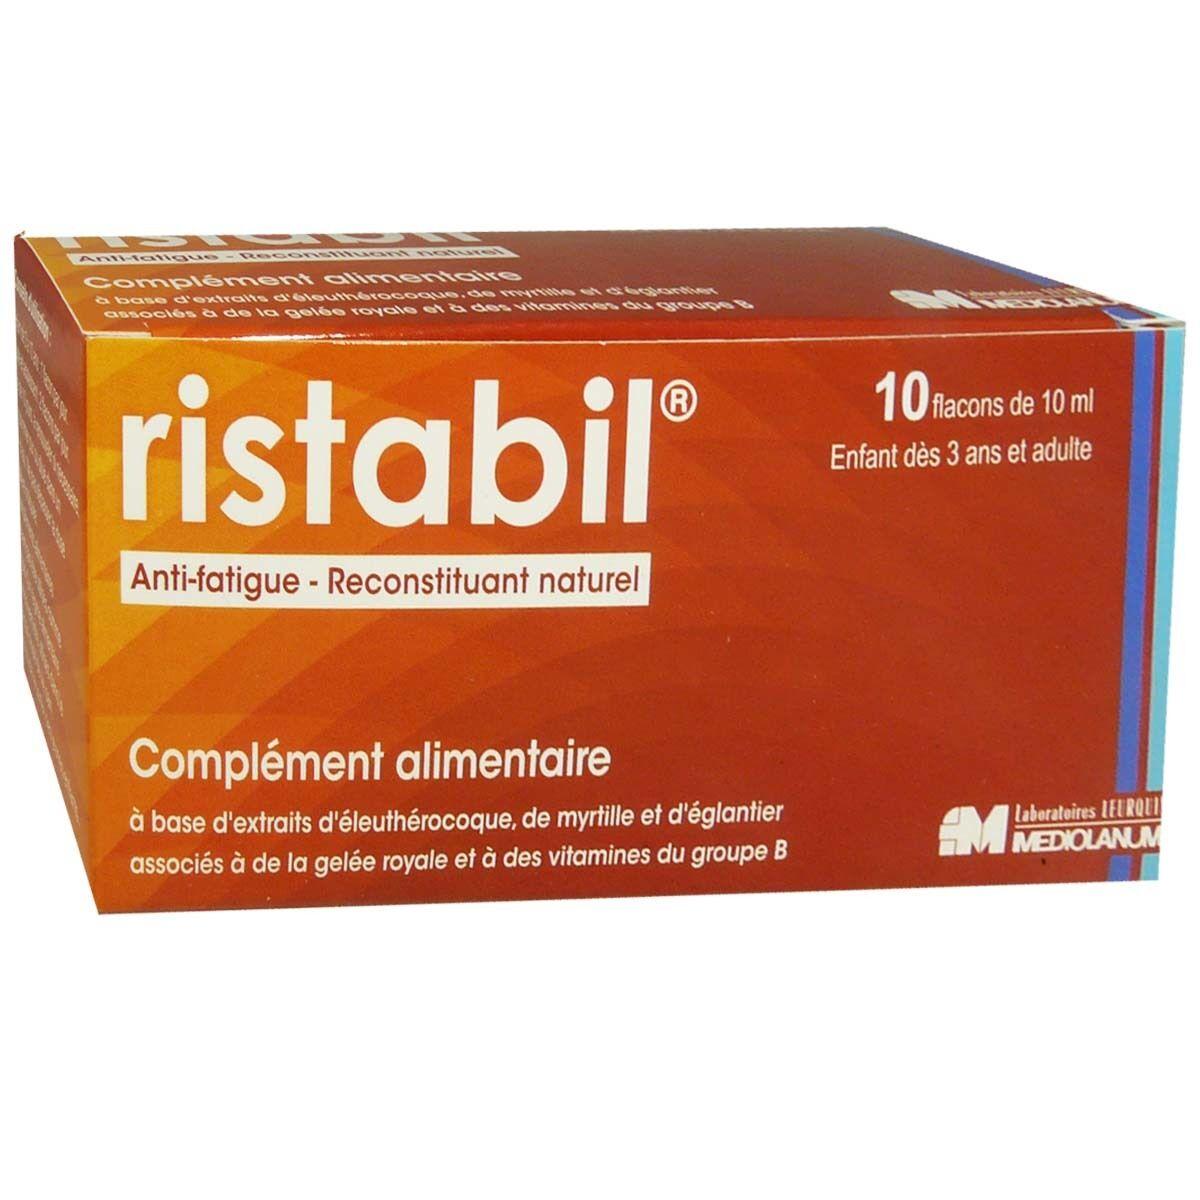 DIVERS Ristabil anti-fatigue reconstituant naturel 10 flacons 10 ml